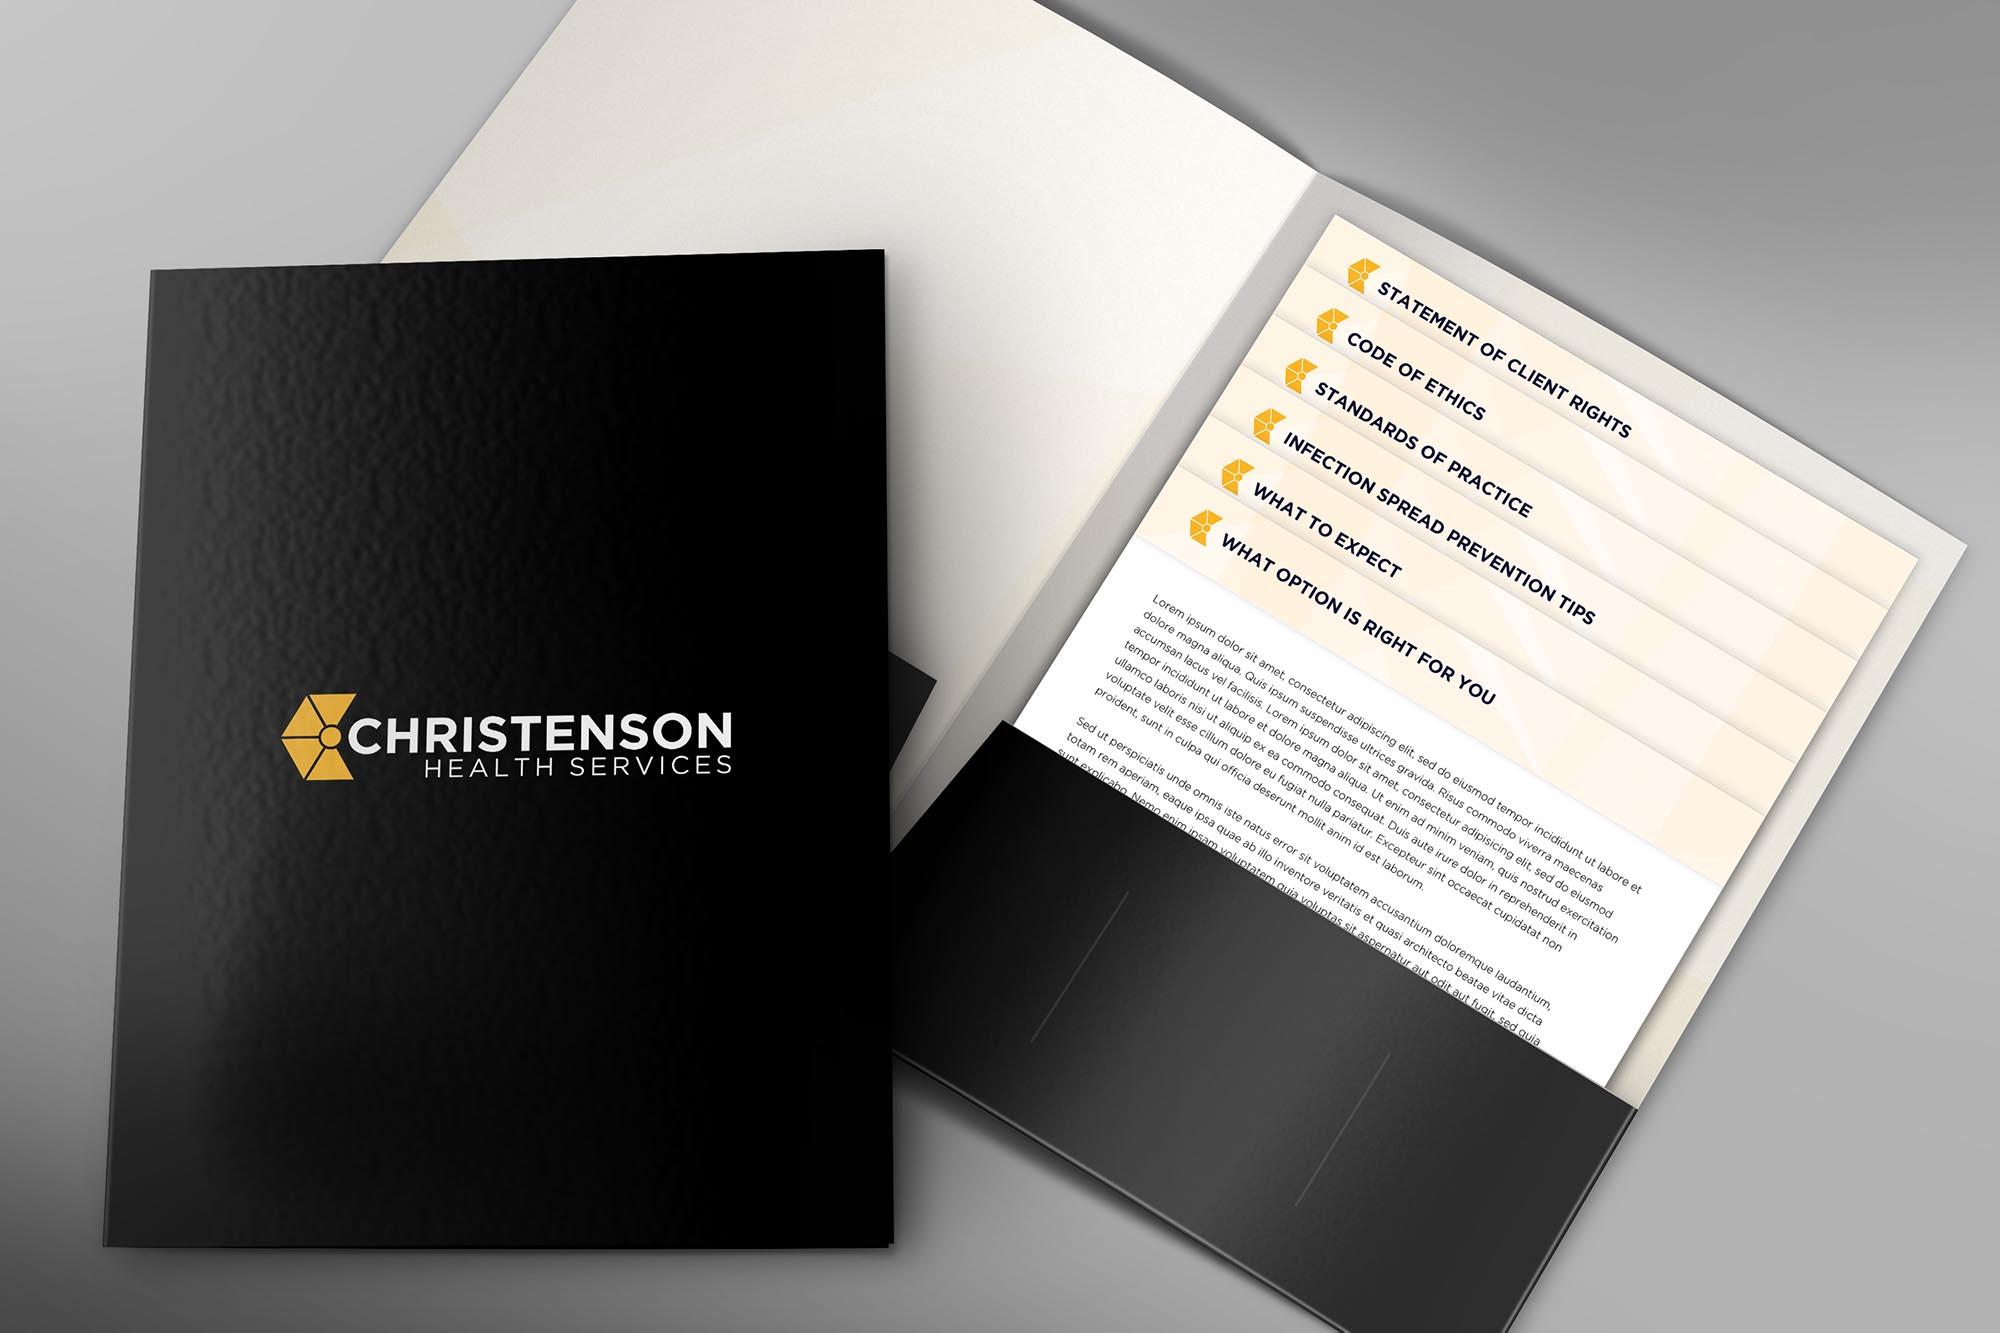 Presentation Folder Design and Insert Print Designer Edmonton